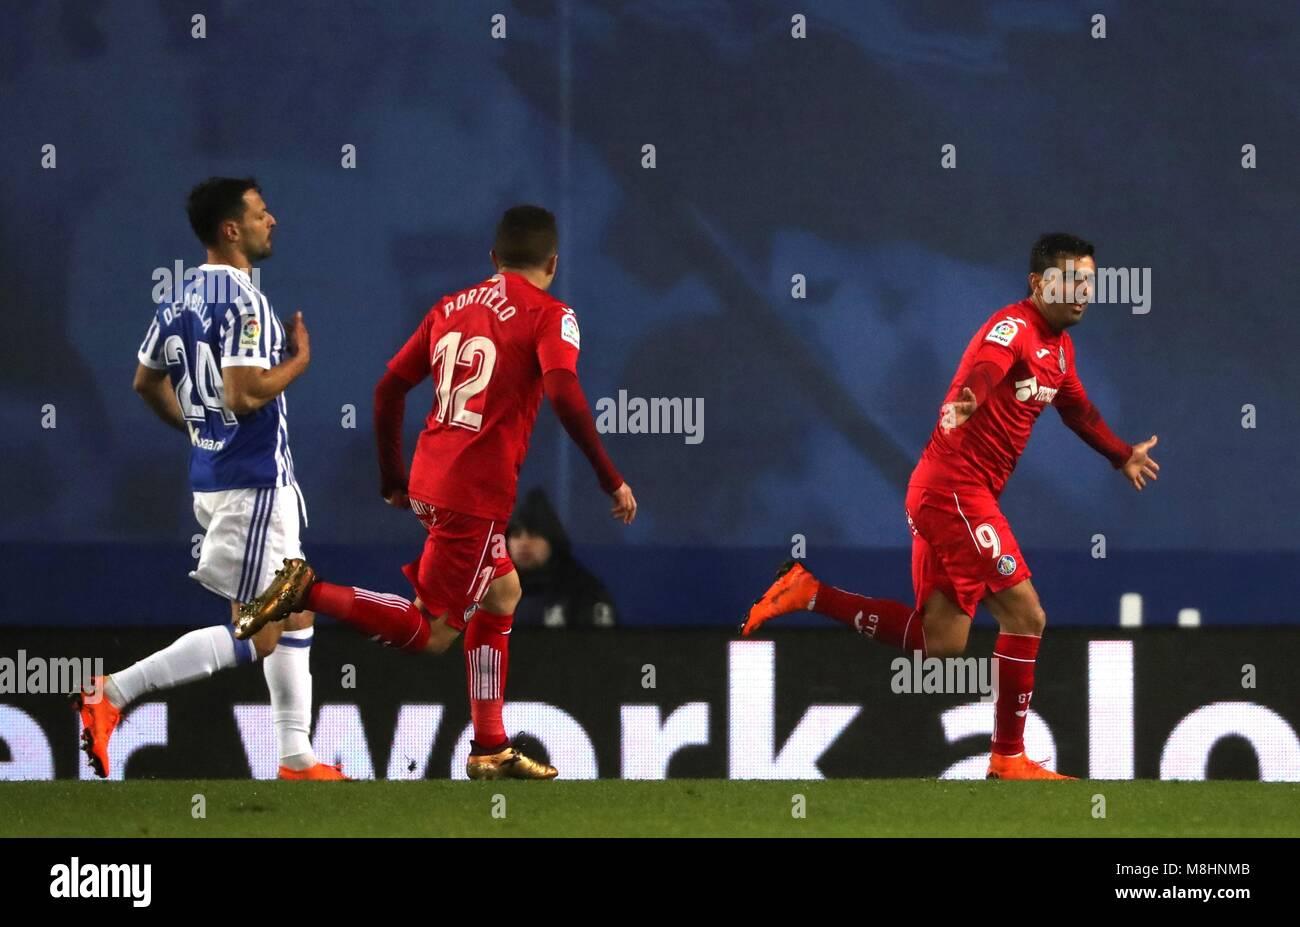 Getafe s Angel Rodríguez (R) celebrates a goal during the Spanish Primera  Division Liga soccer c58a0288632b8